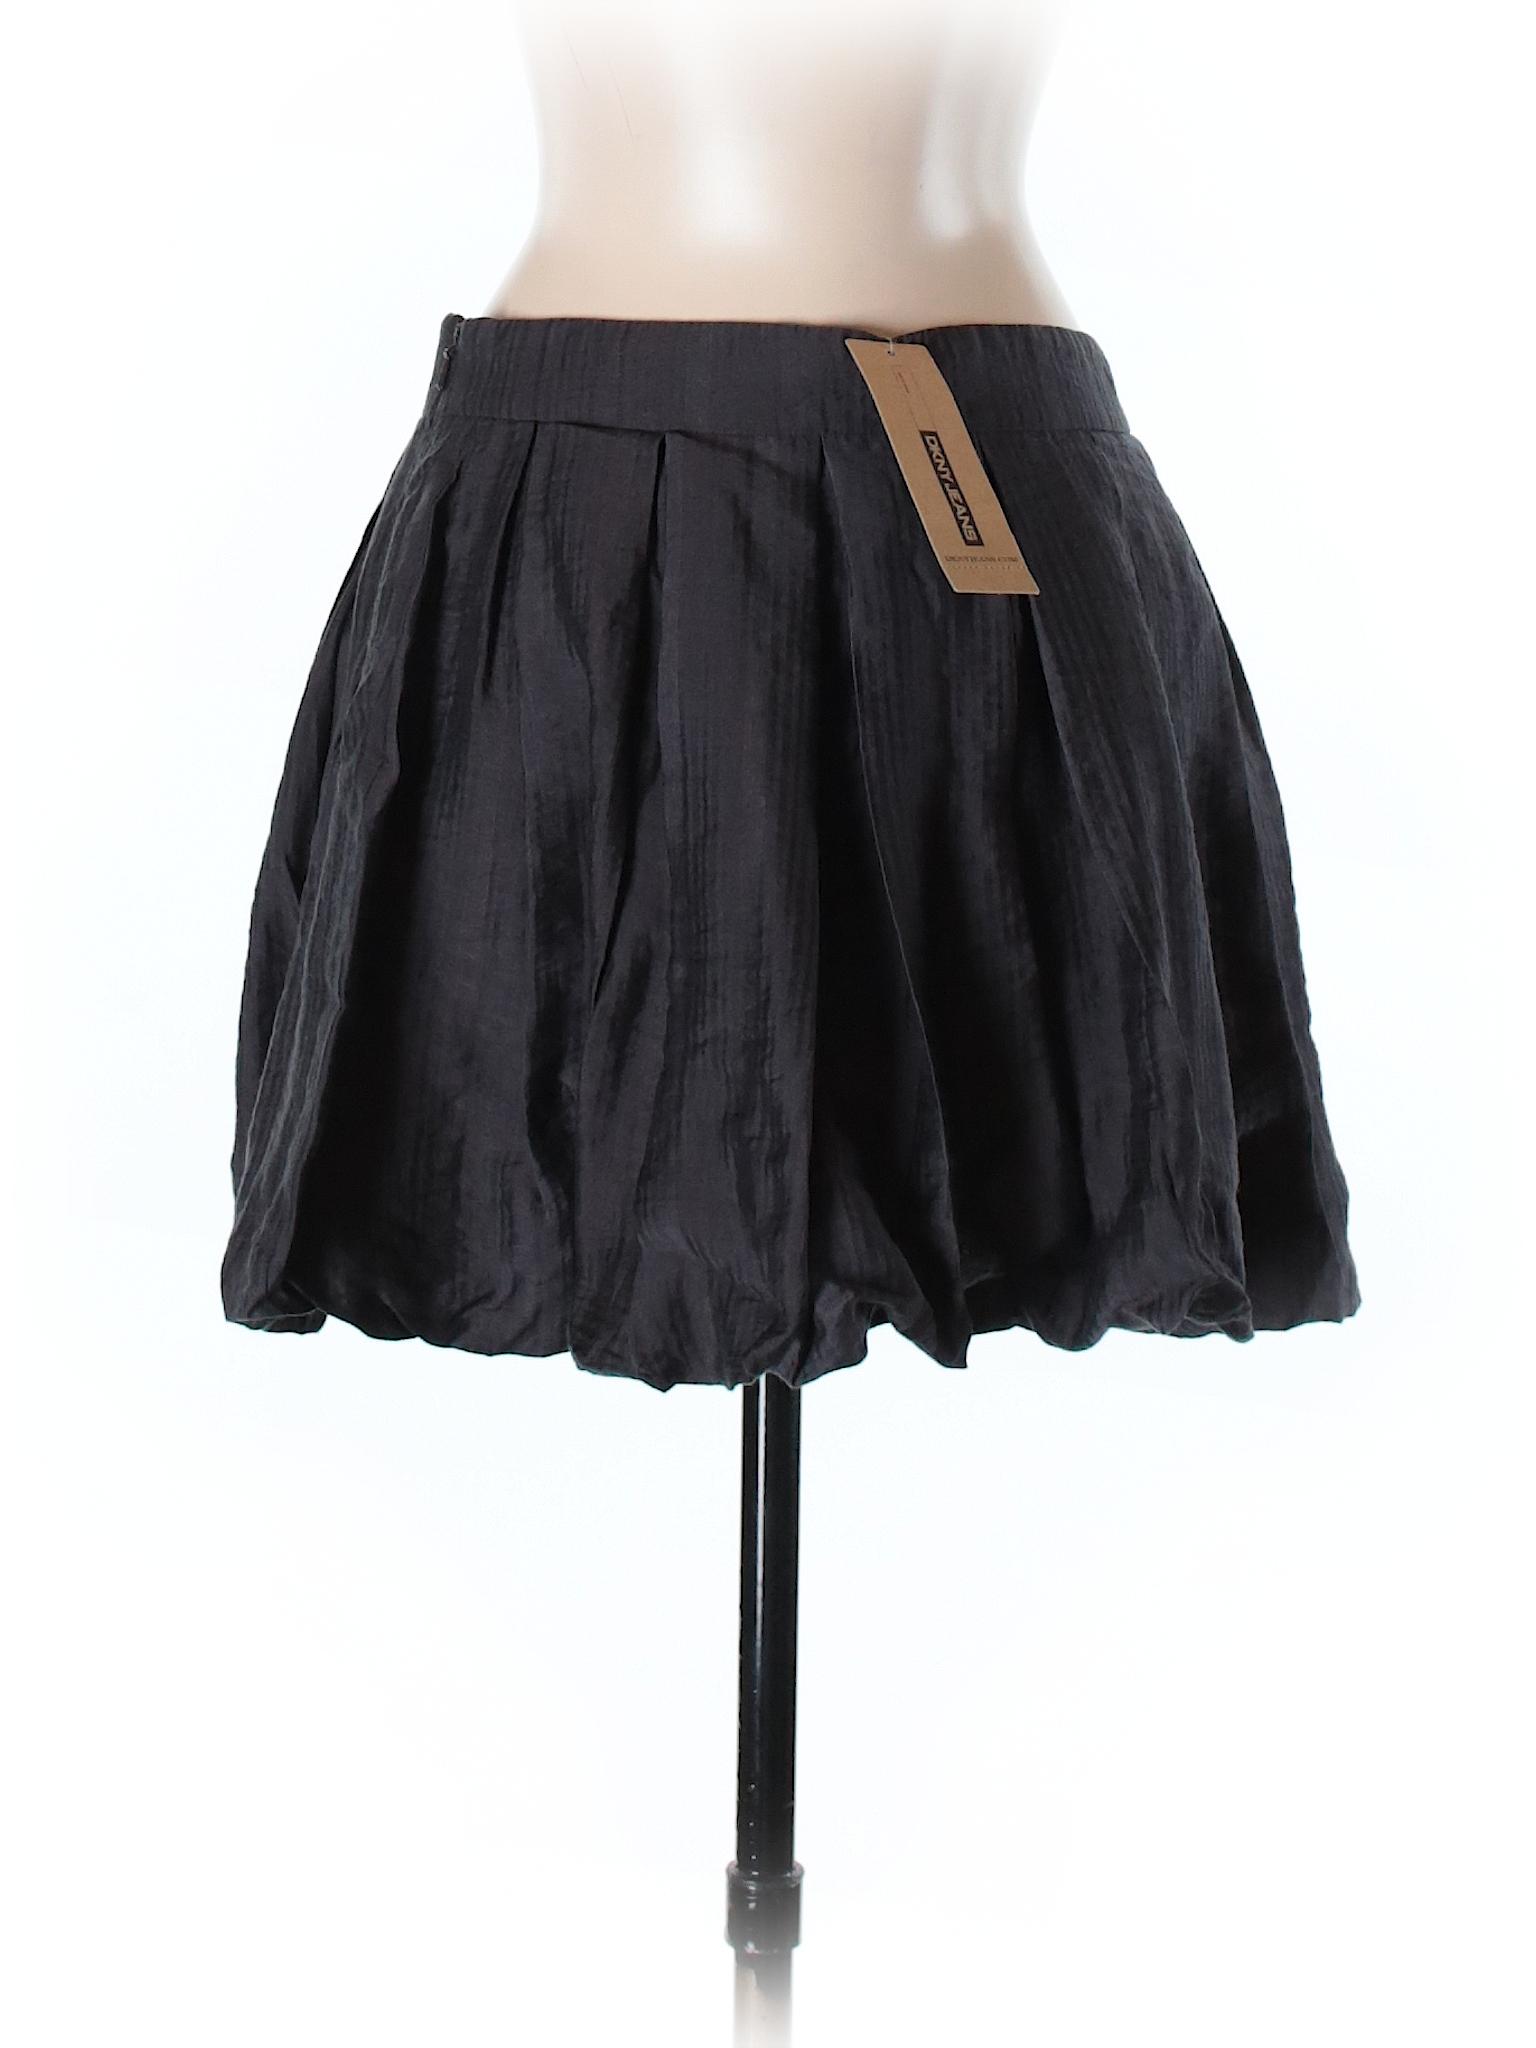 Boutique Skirt Boutique Casual Casual Skirt Casual Boutique Boutique Boutique Skirt Skirt Casual rwPRrpBq